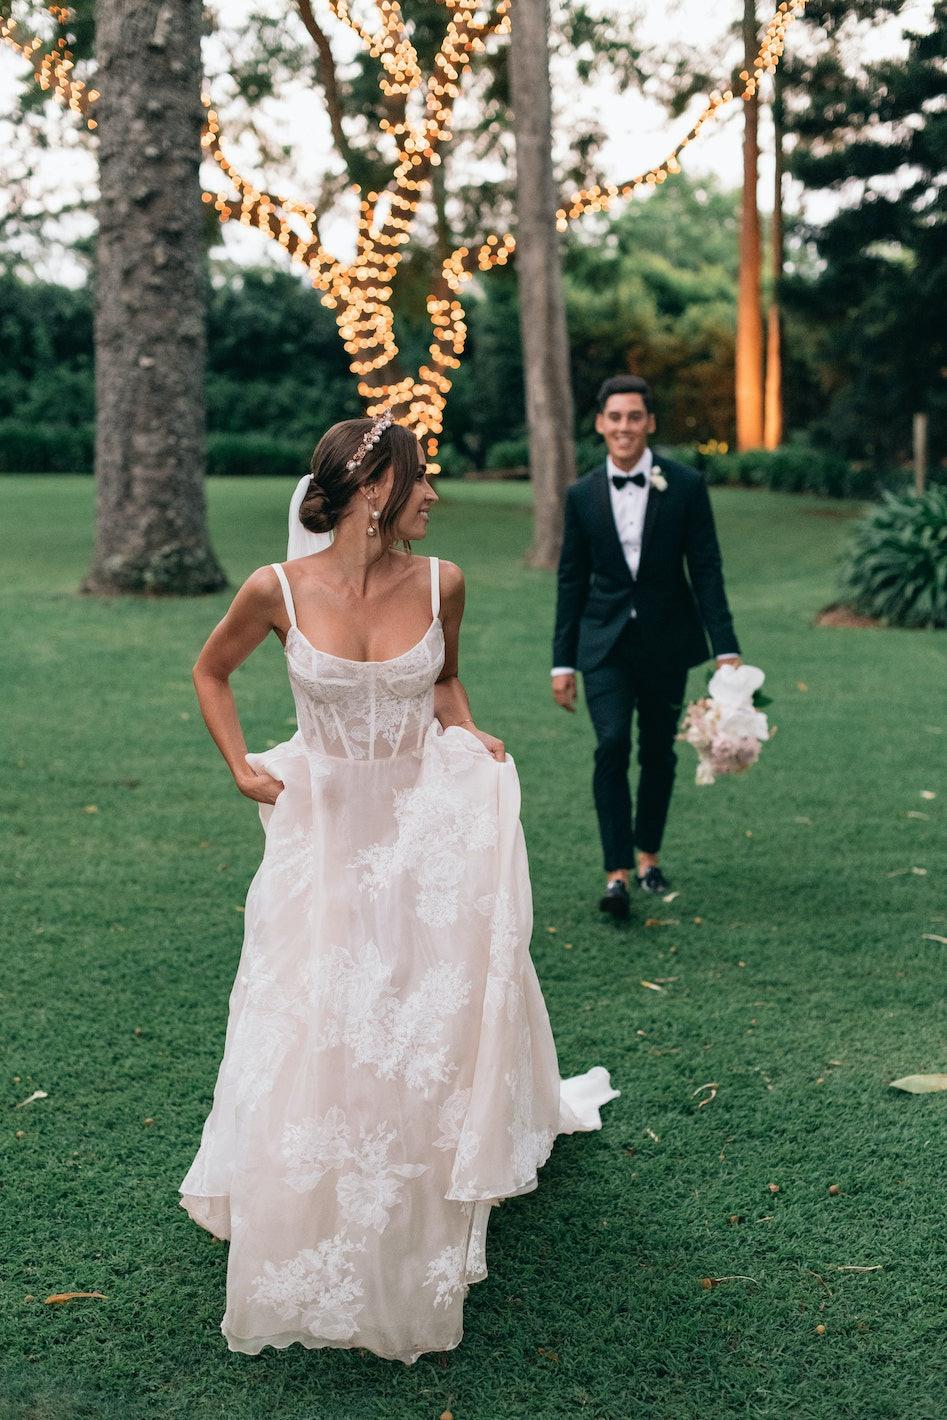 Bride and groom walking in gardens